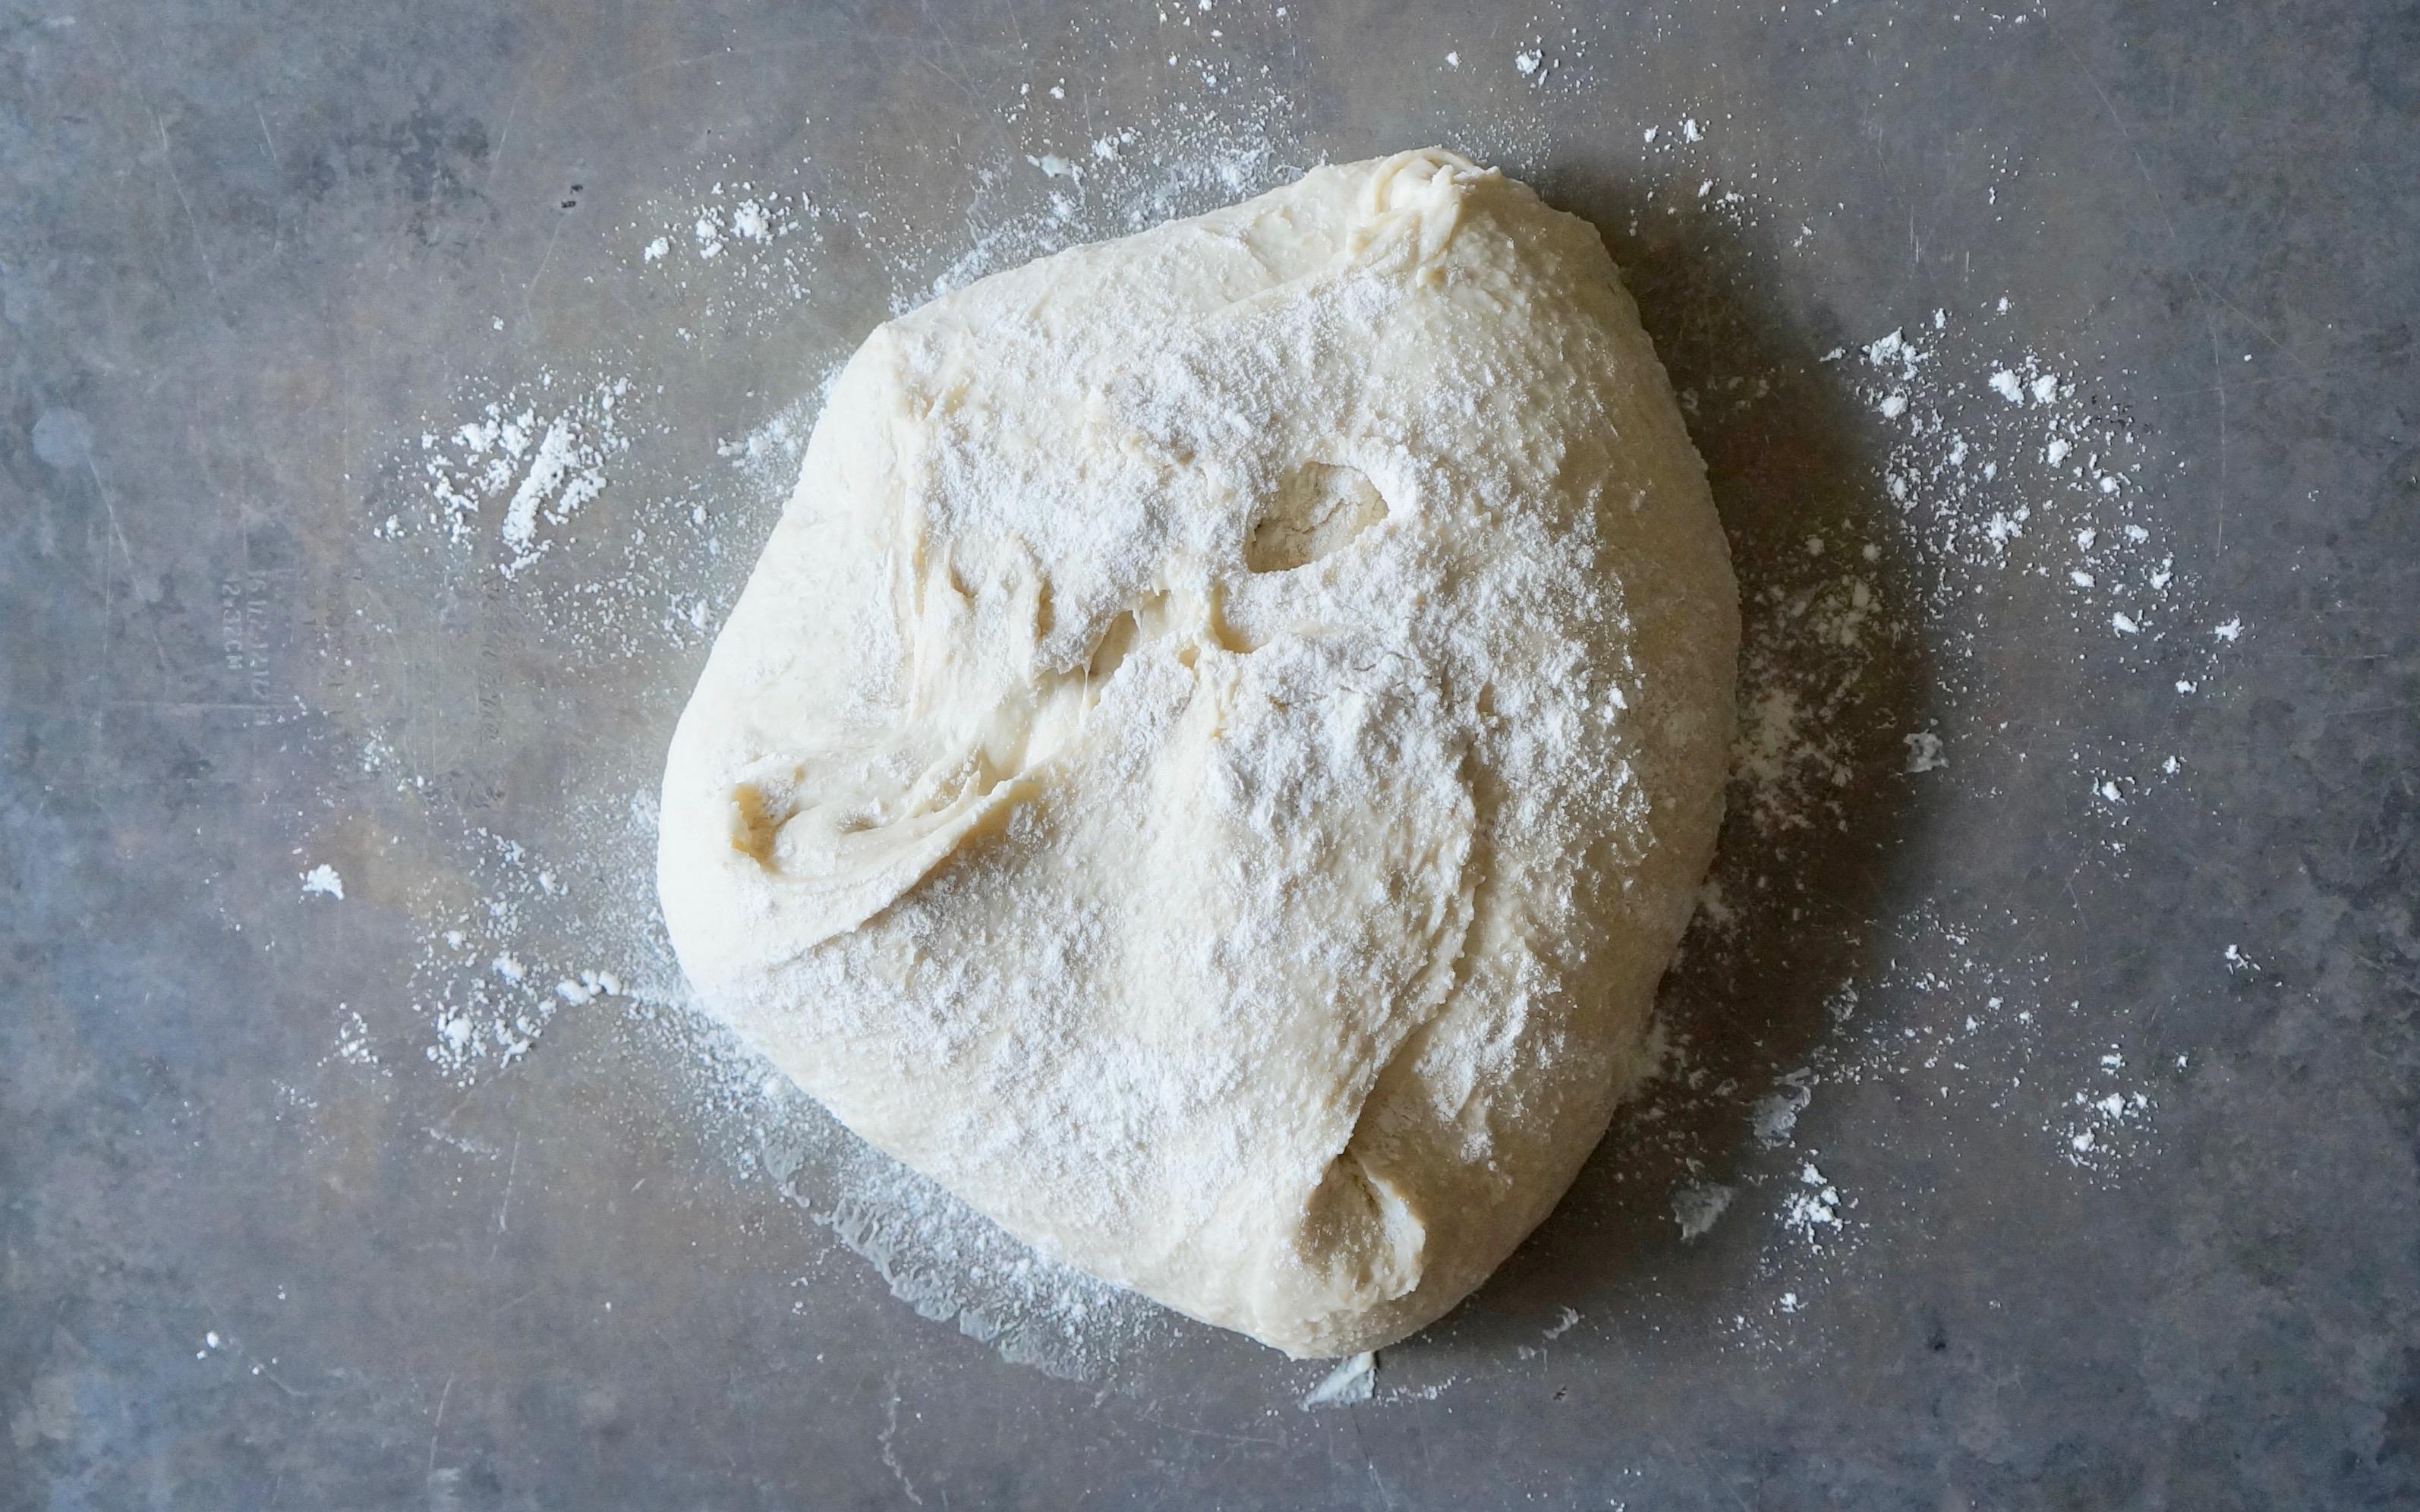 Buttermilk-Bolillo-Rebecca-Gordon-Editor-In-Chief-Buttermilk-Lipstick-Culinary-Entertaining-Techniques-Southern-Hostess-RebeccaGordon-Pastry-Chef-Southern-Entertaining-Birmingham-Alabama